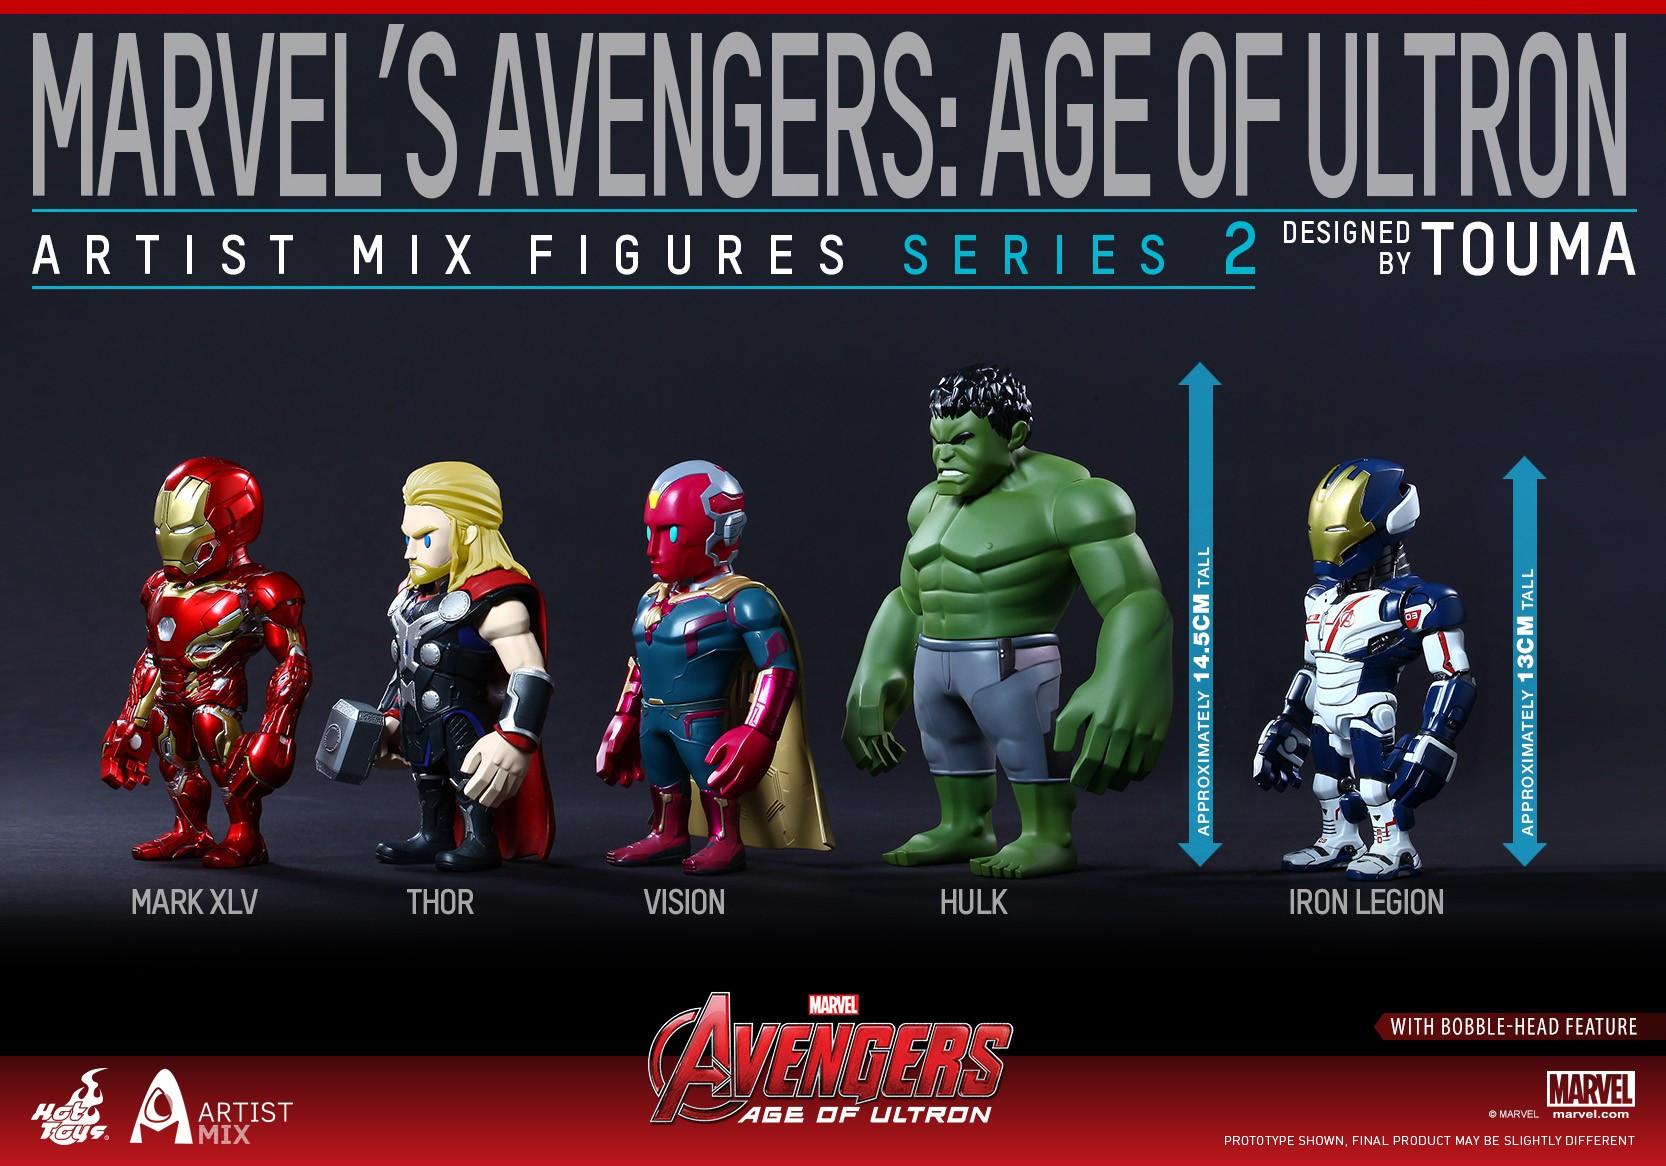 Hot Toys Artist Mix Touma Age of Ultron Avengers Hulk Mark 45 XLV Thor Vision